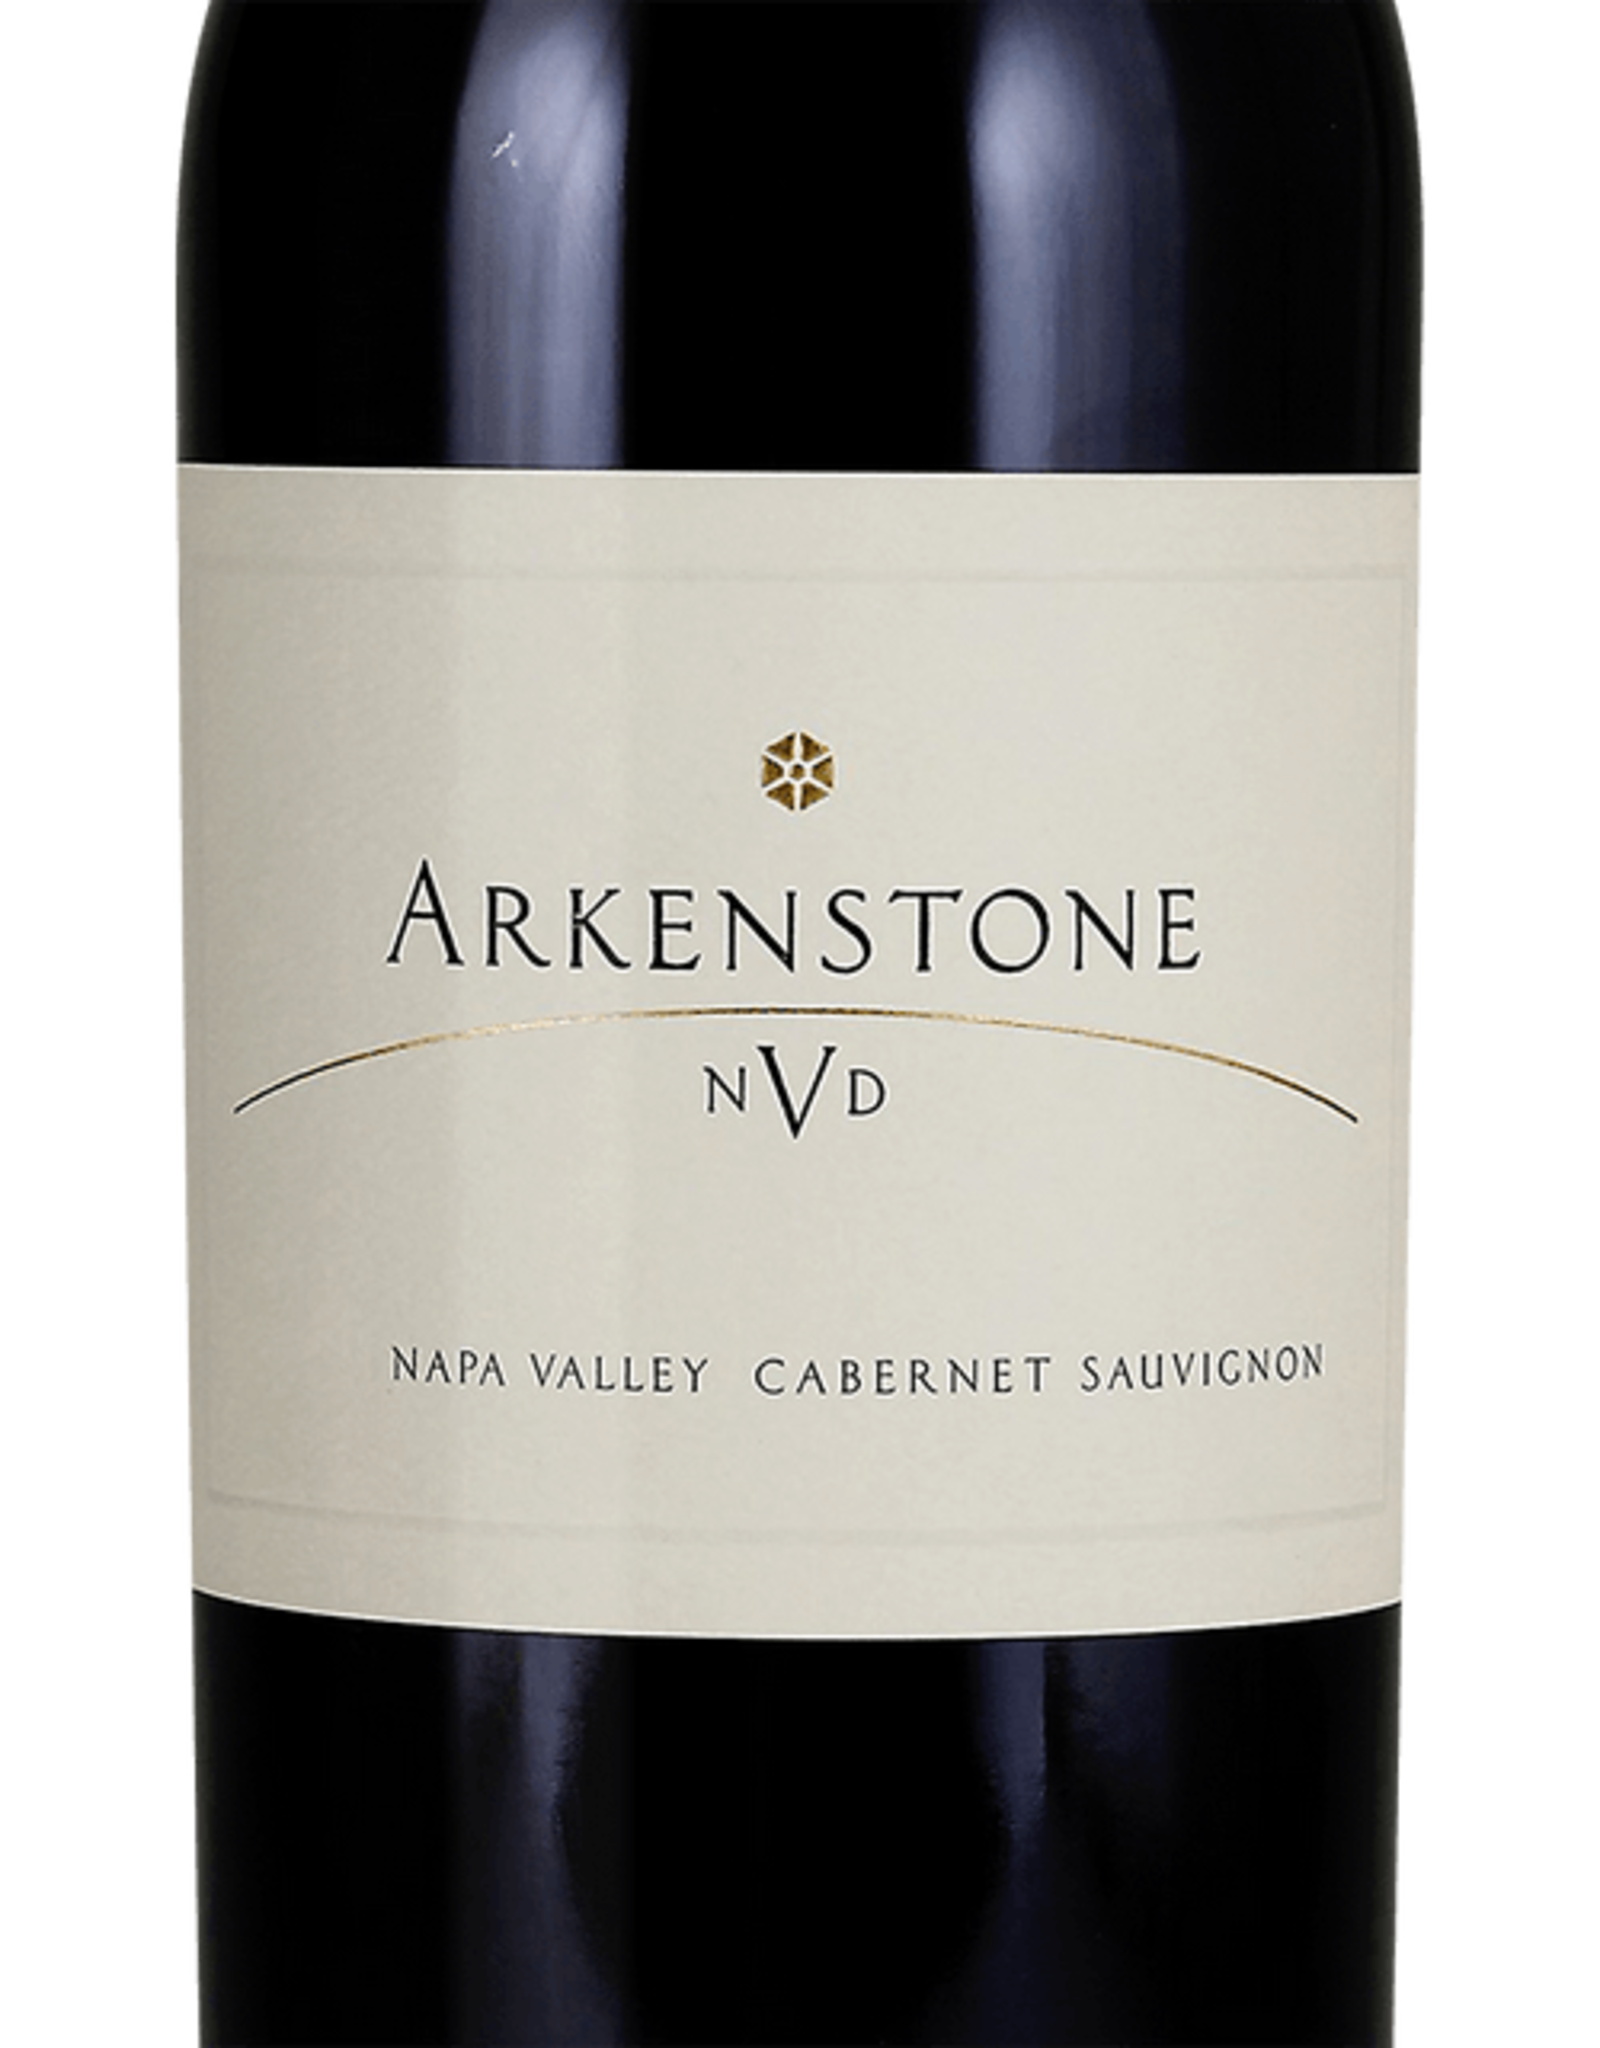 Arkenstone NVD Napa 2014